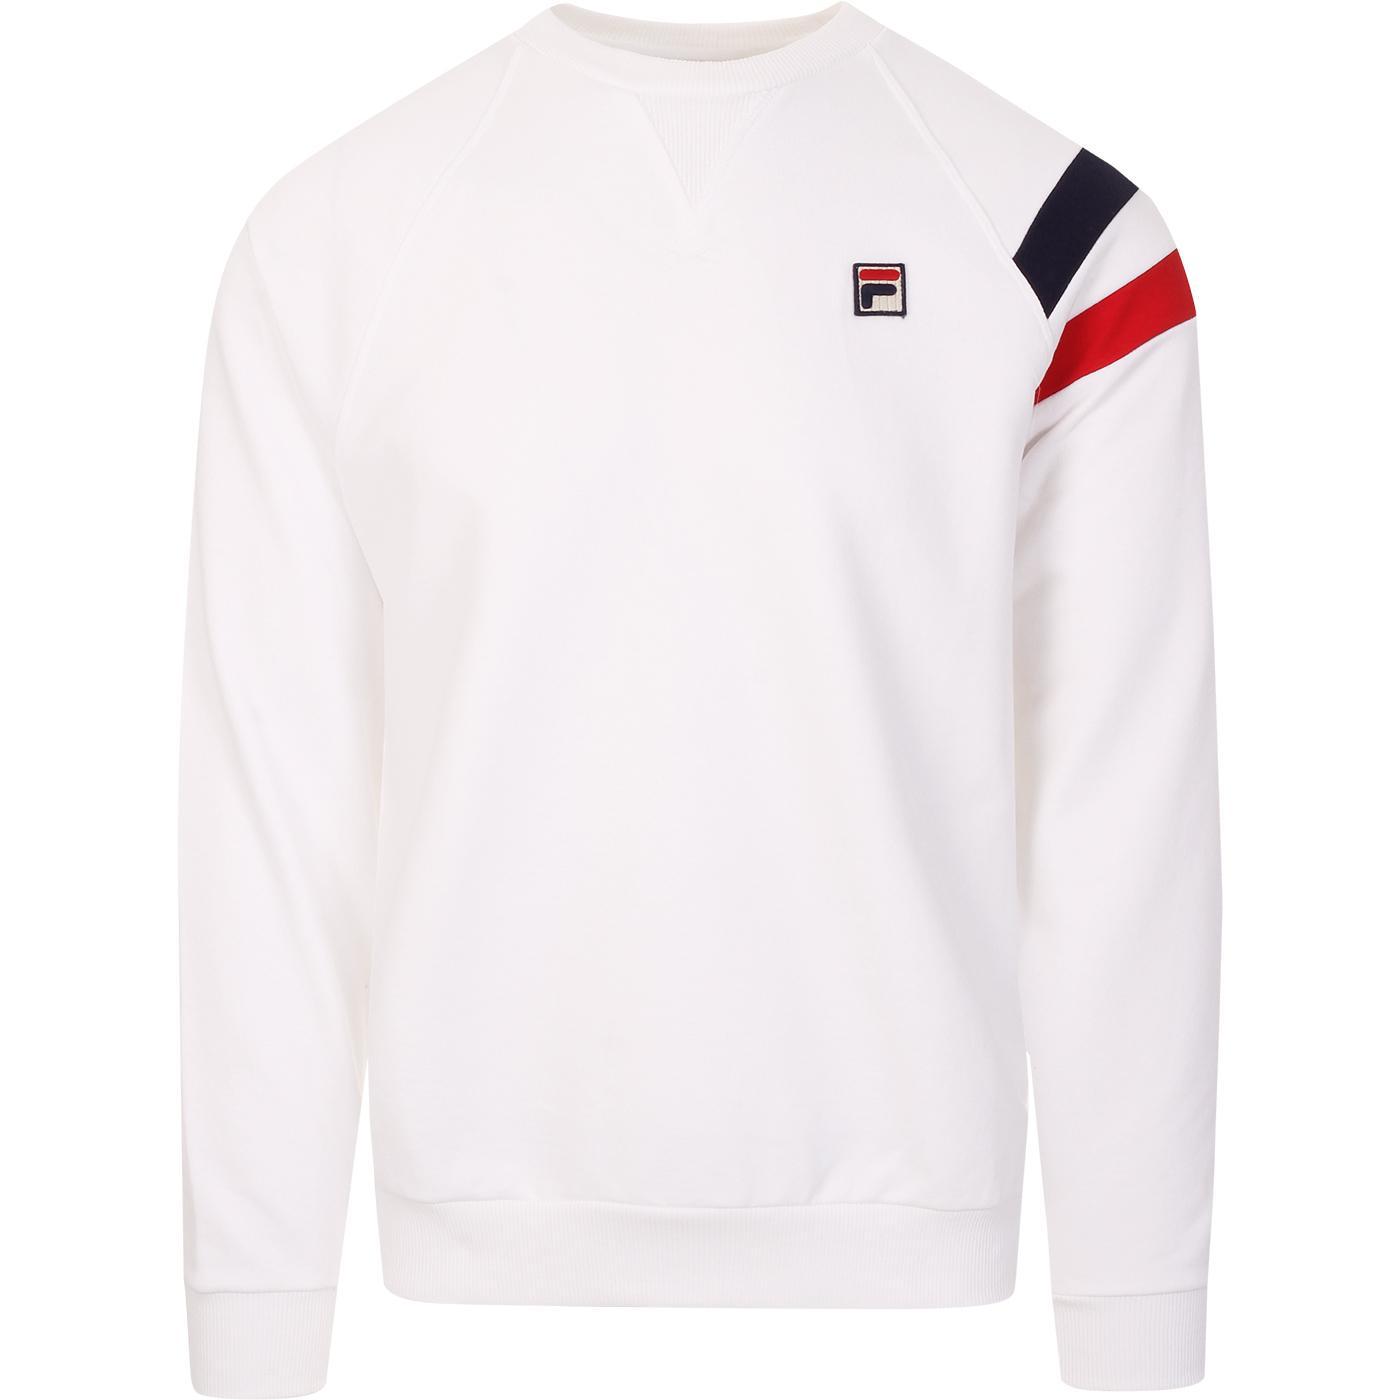 Acers FILA VINTAGE Raglan Sleeve Sweatshirt (W)